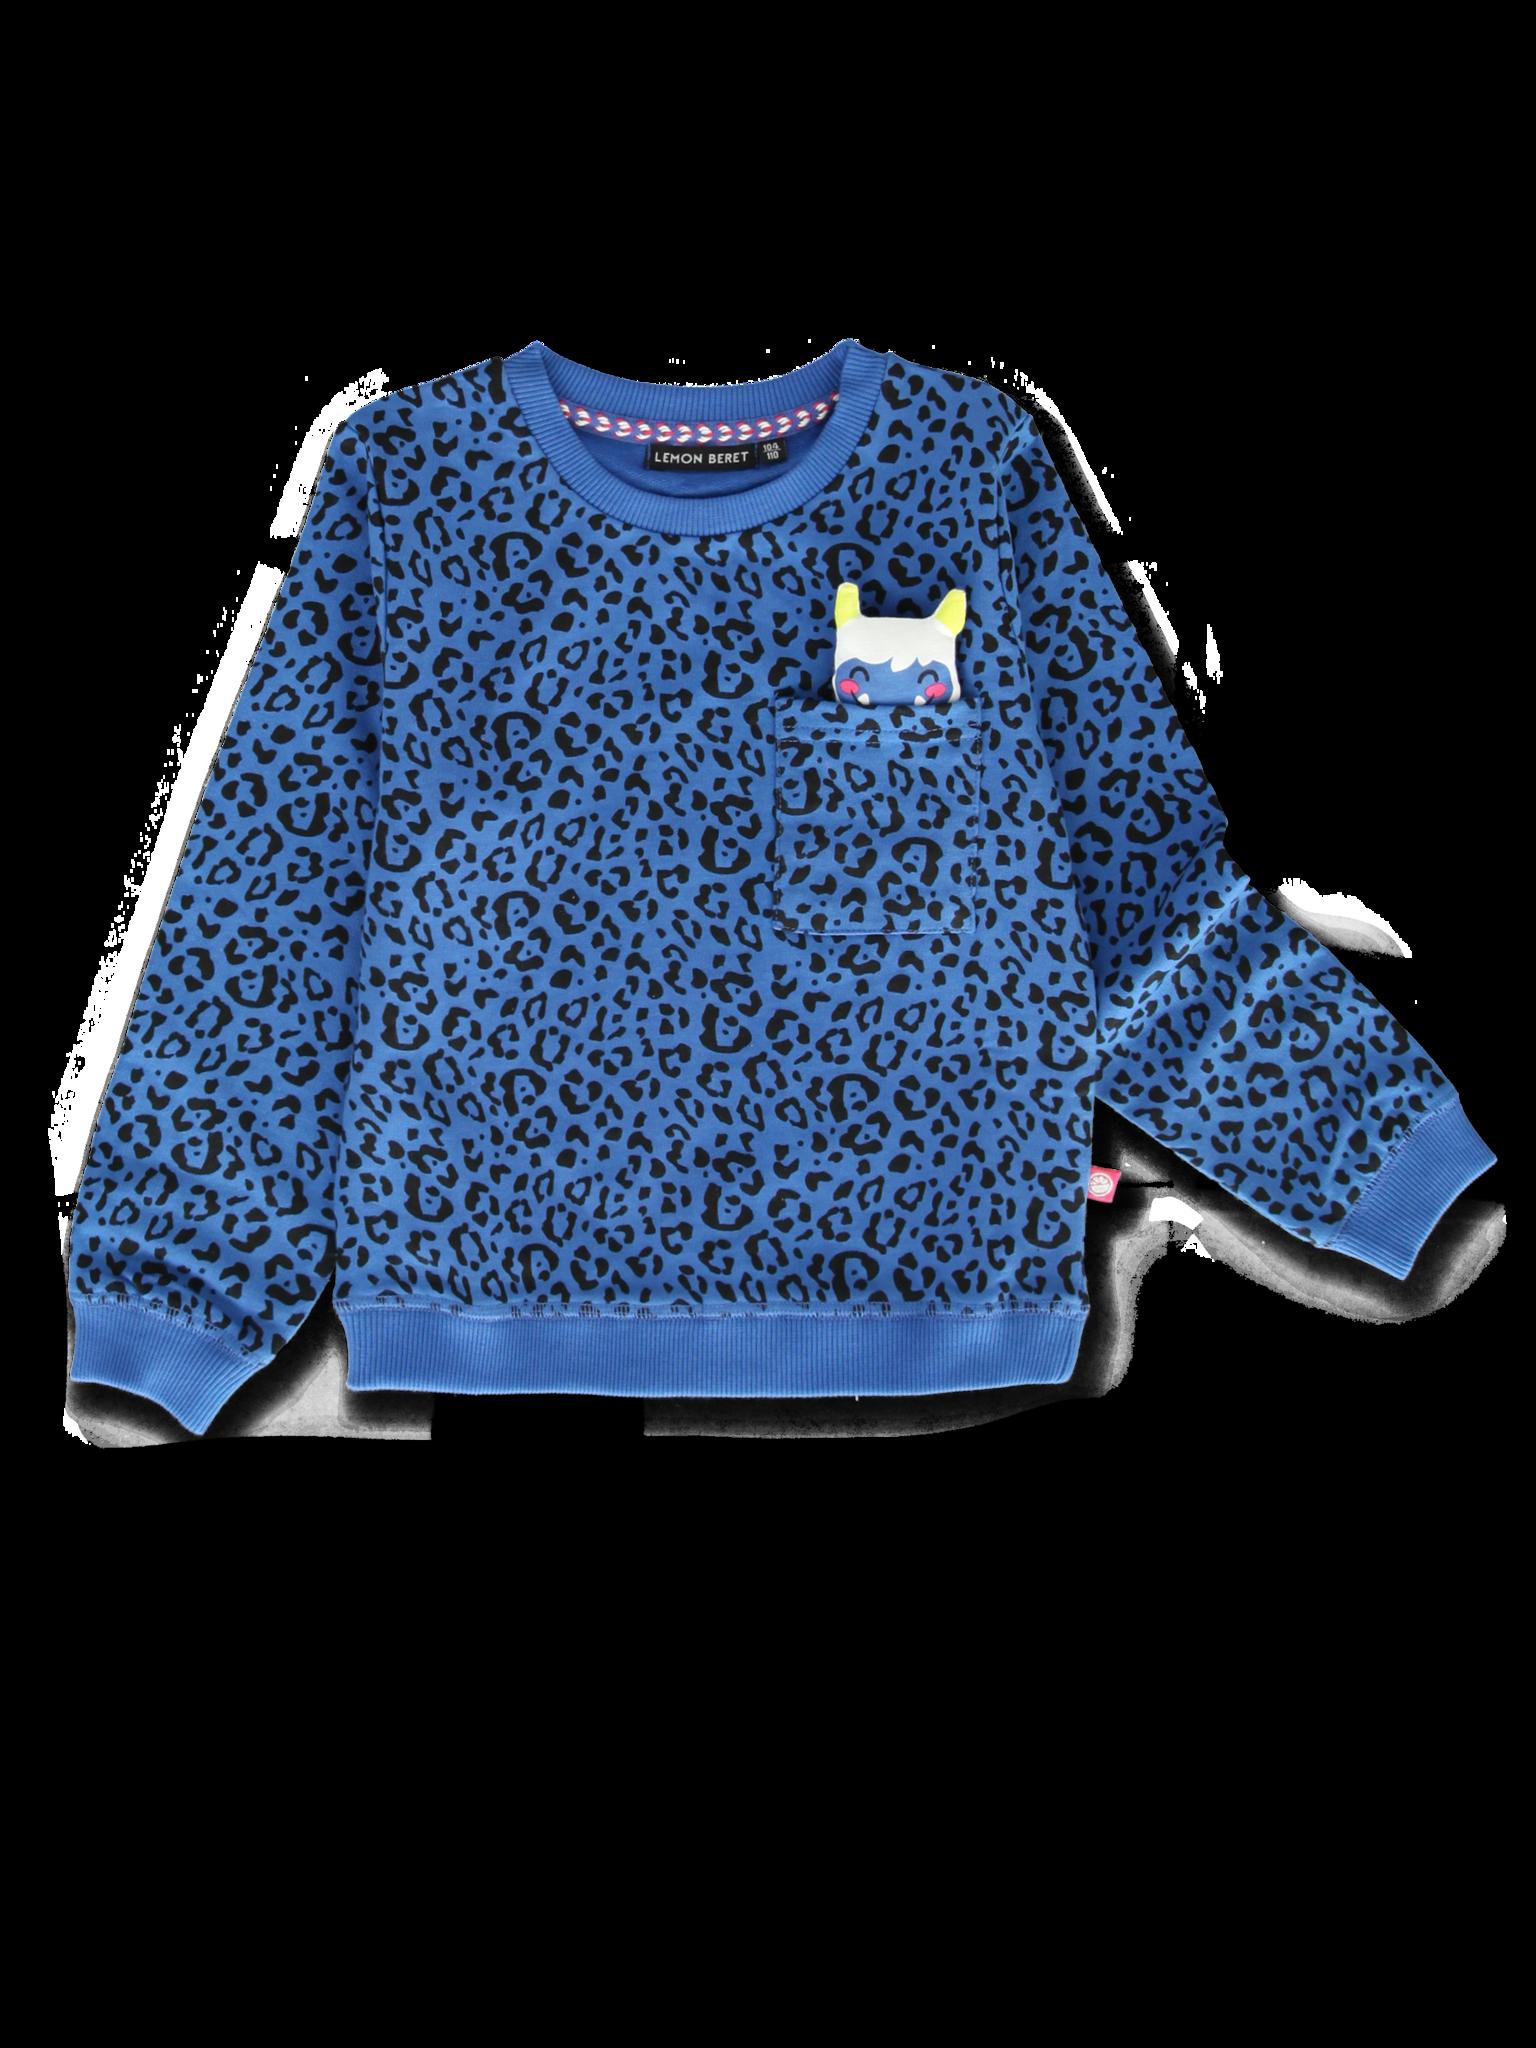 All Brands   Winterproducts Small Girls   Sweatshirt   12 pcs/box